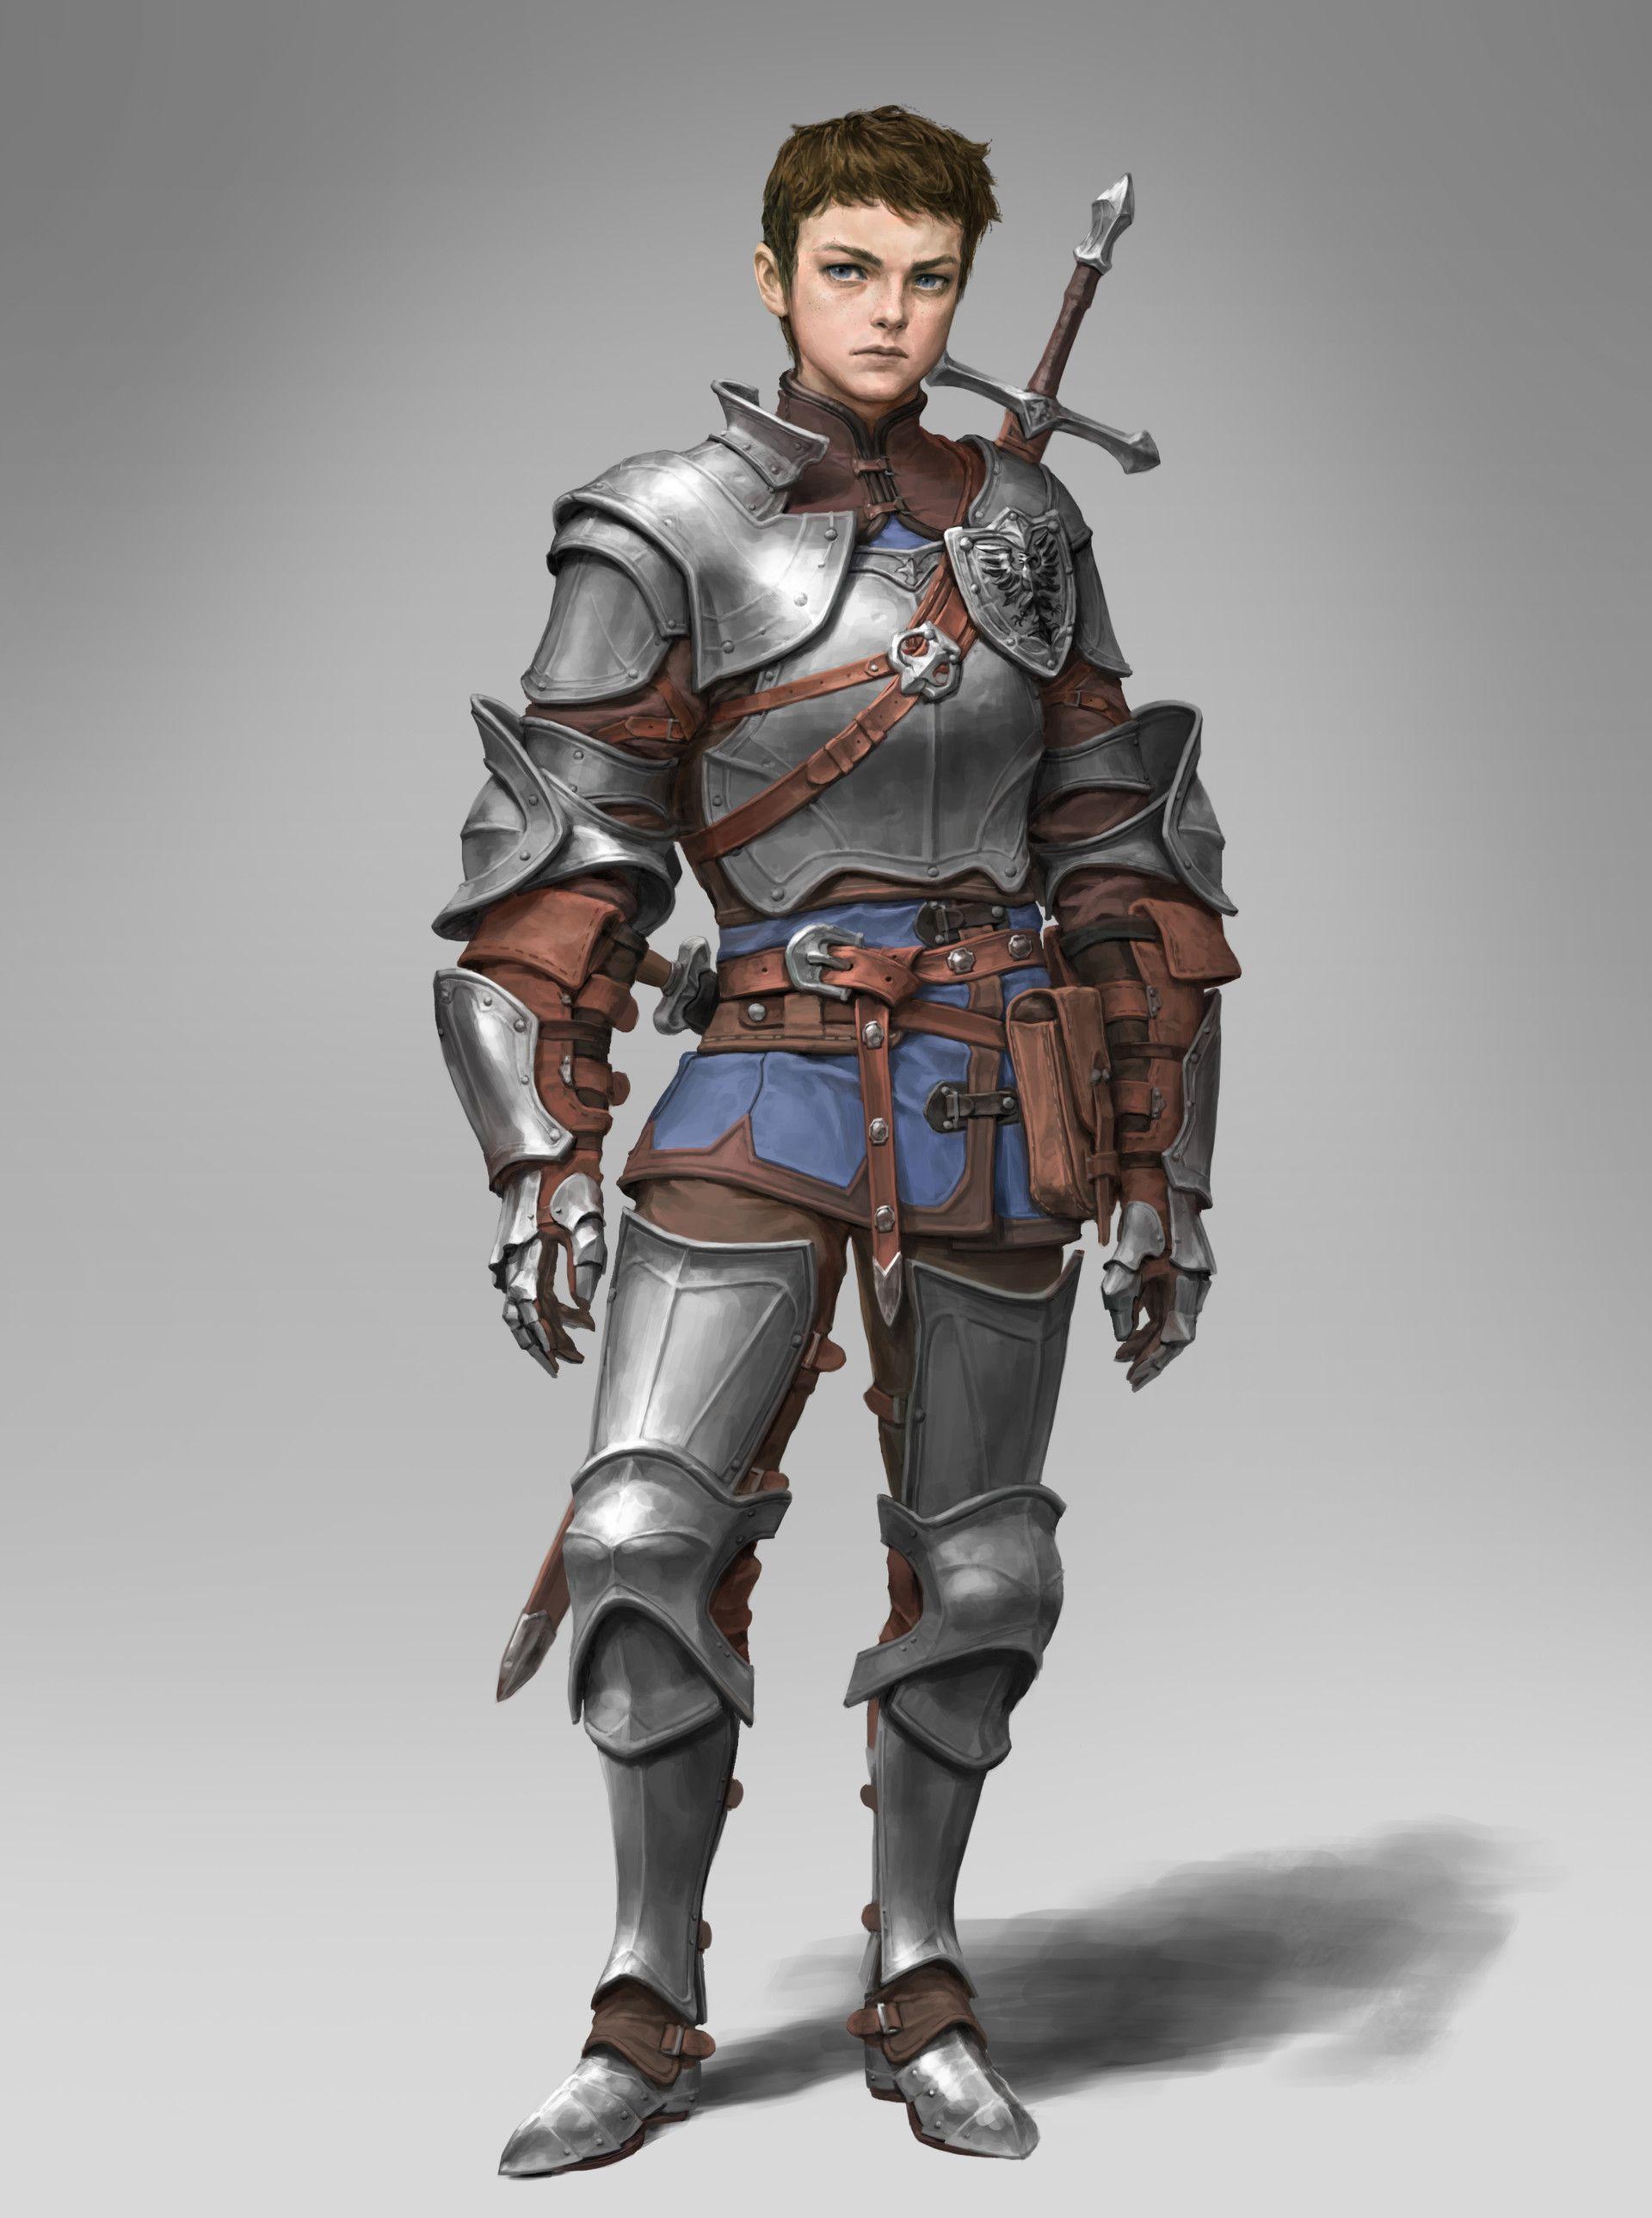 M Paladin Plate Armor 2 Handed Sword Dagger Lwlvl Traveler Young Knight ArtStation Hyunjoong